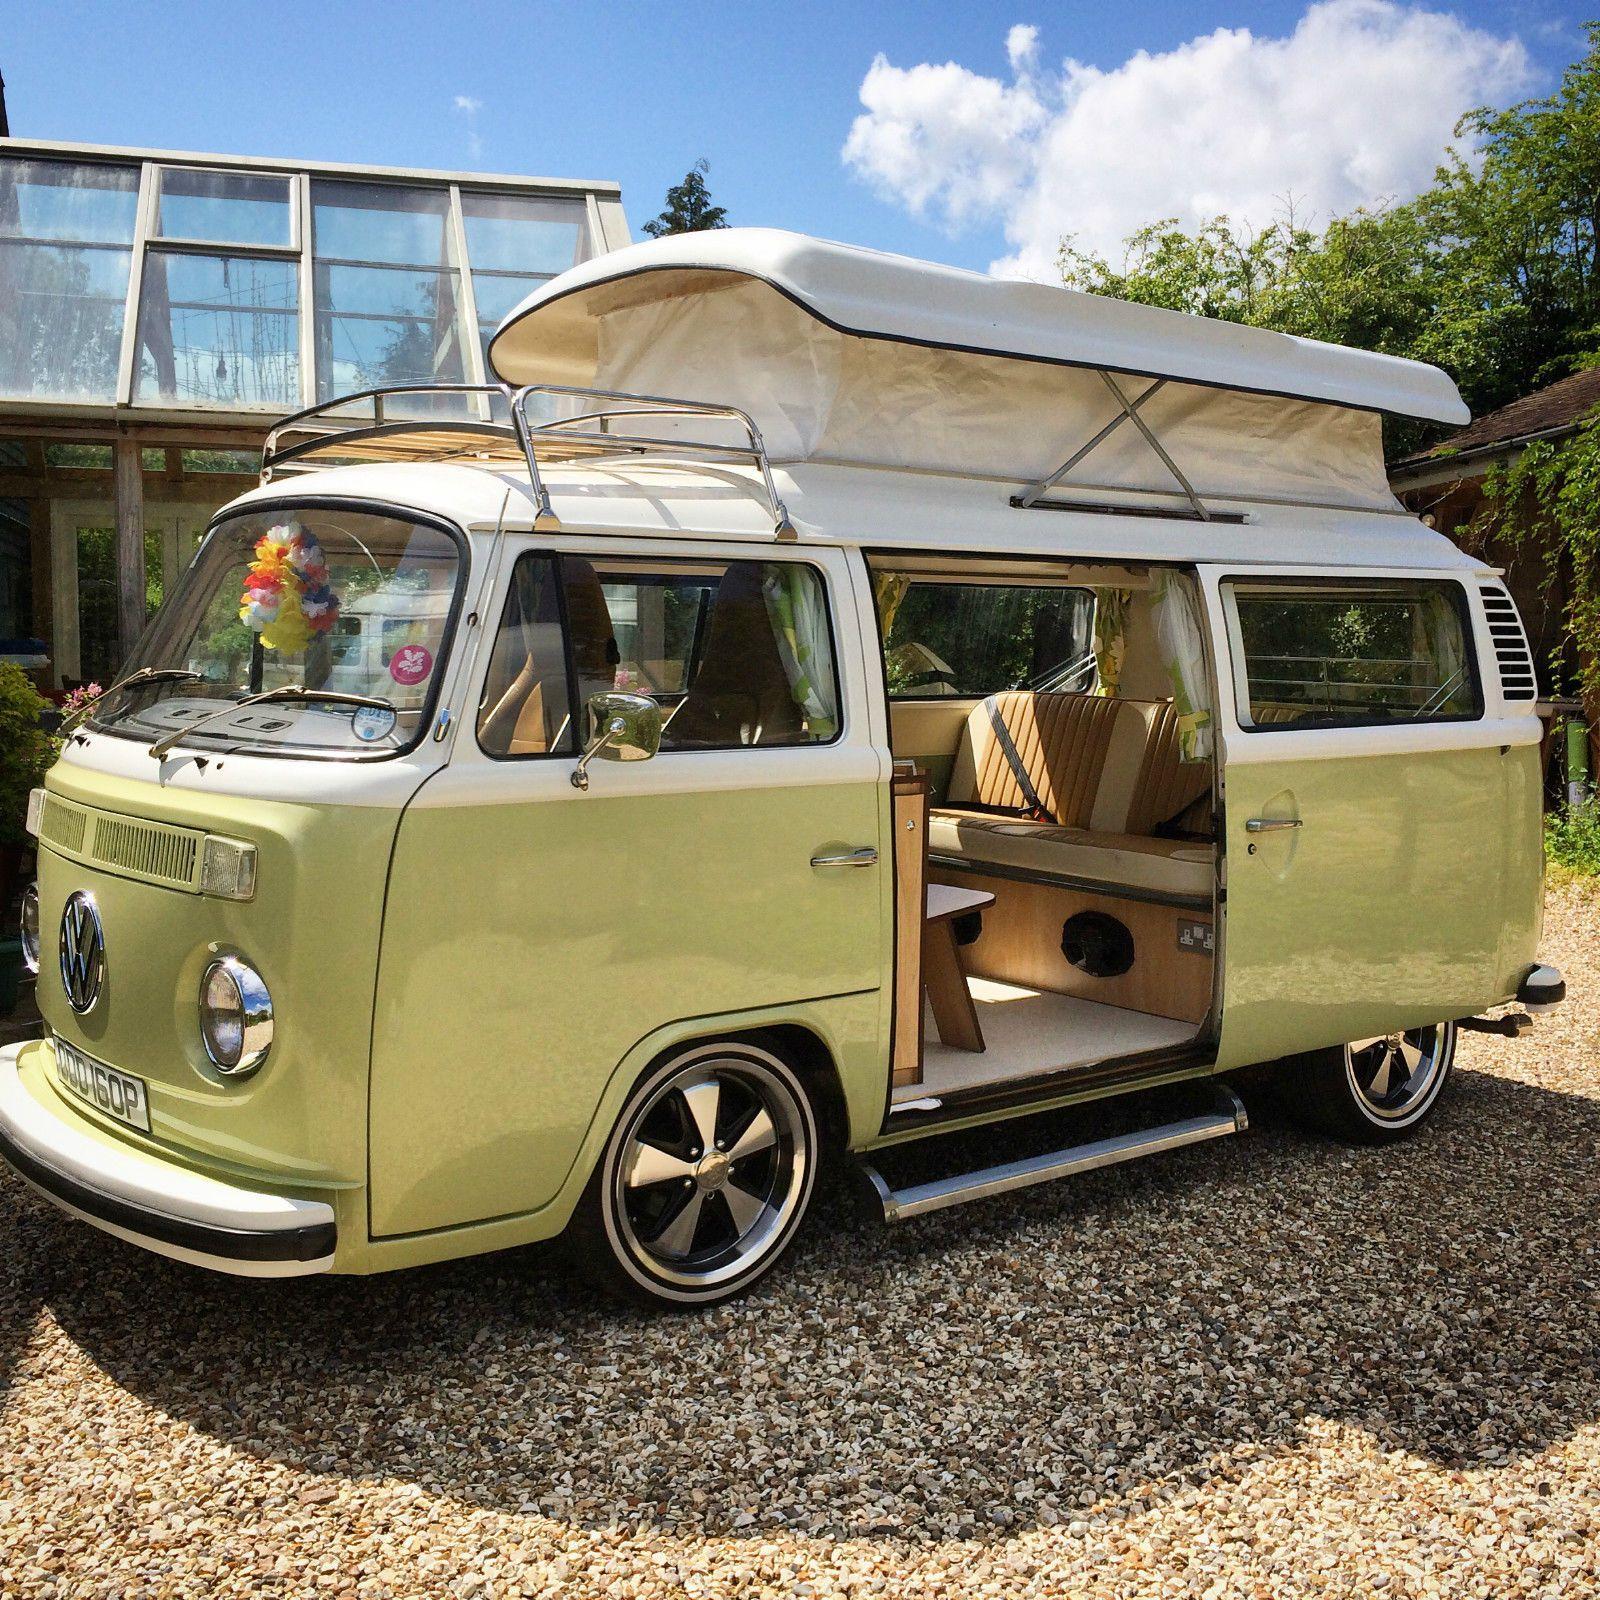 details about volkswagen bay window camper van vw type 2. Black Bedroom Furniture Sets. Home Design Ideas